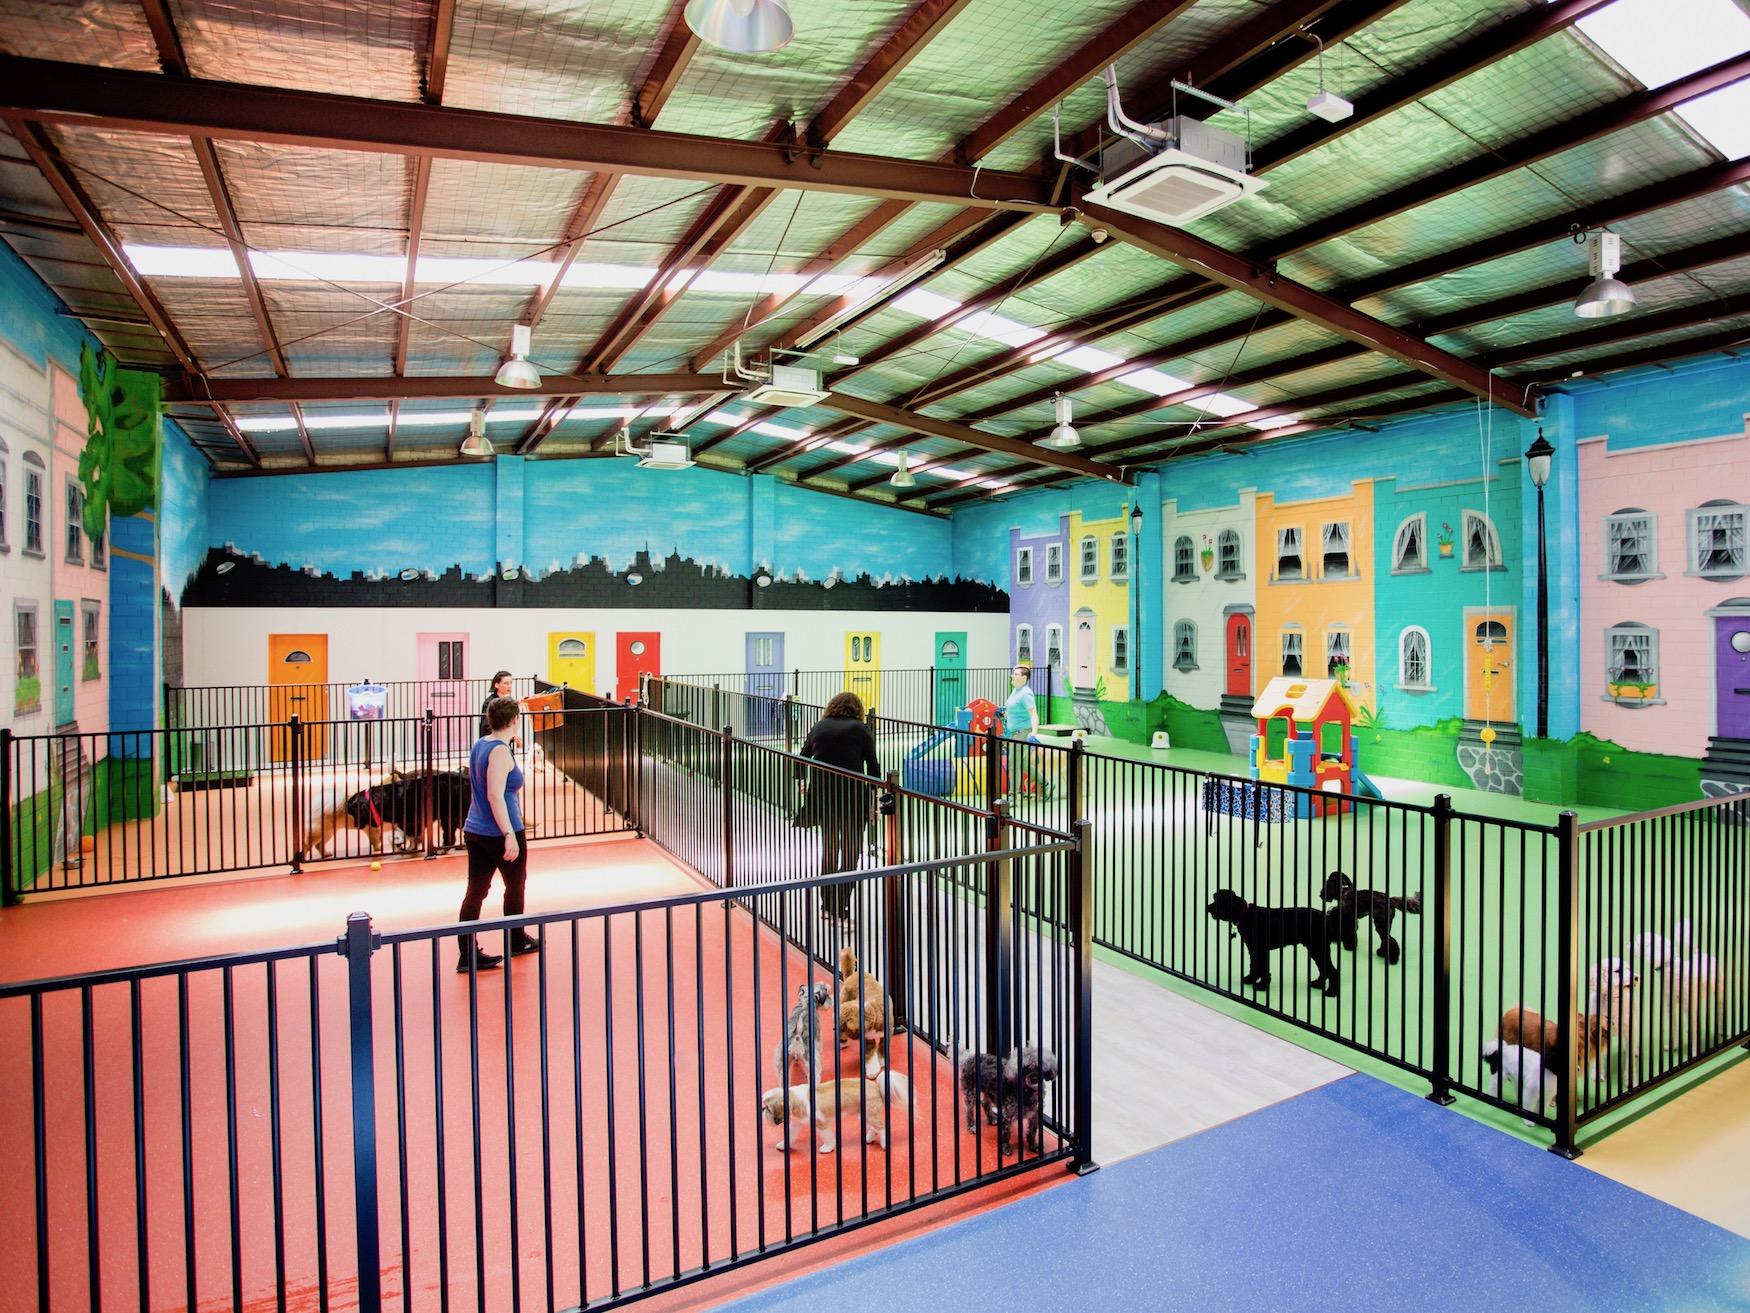 doggie daycare surrey hills, dog daycare